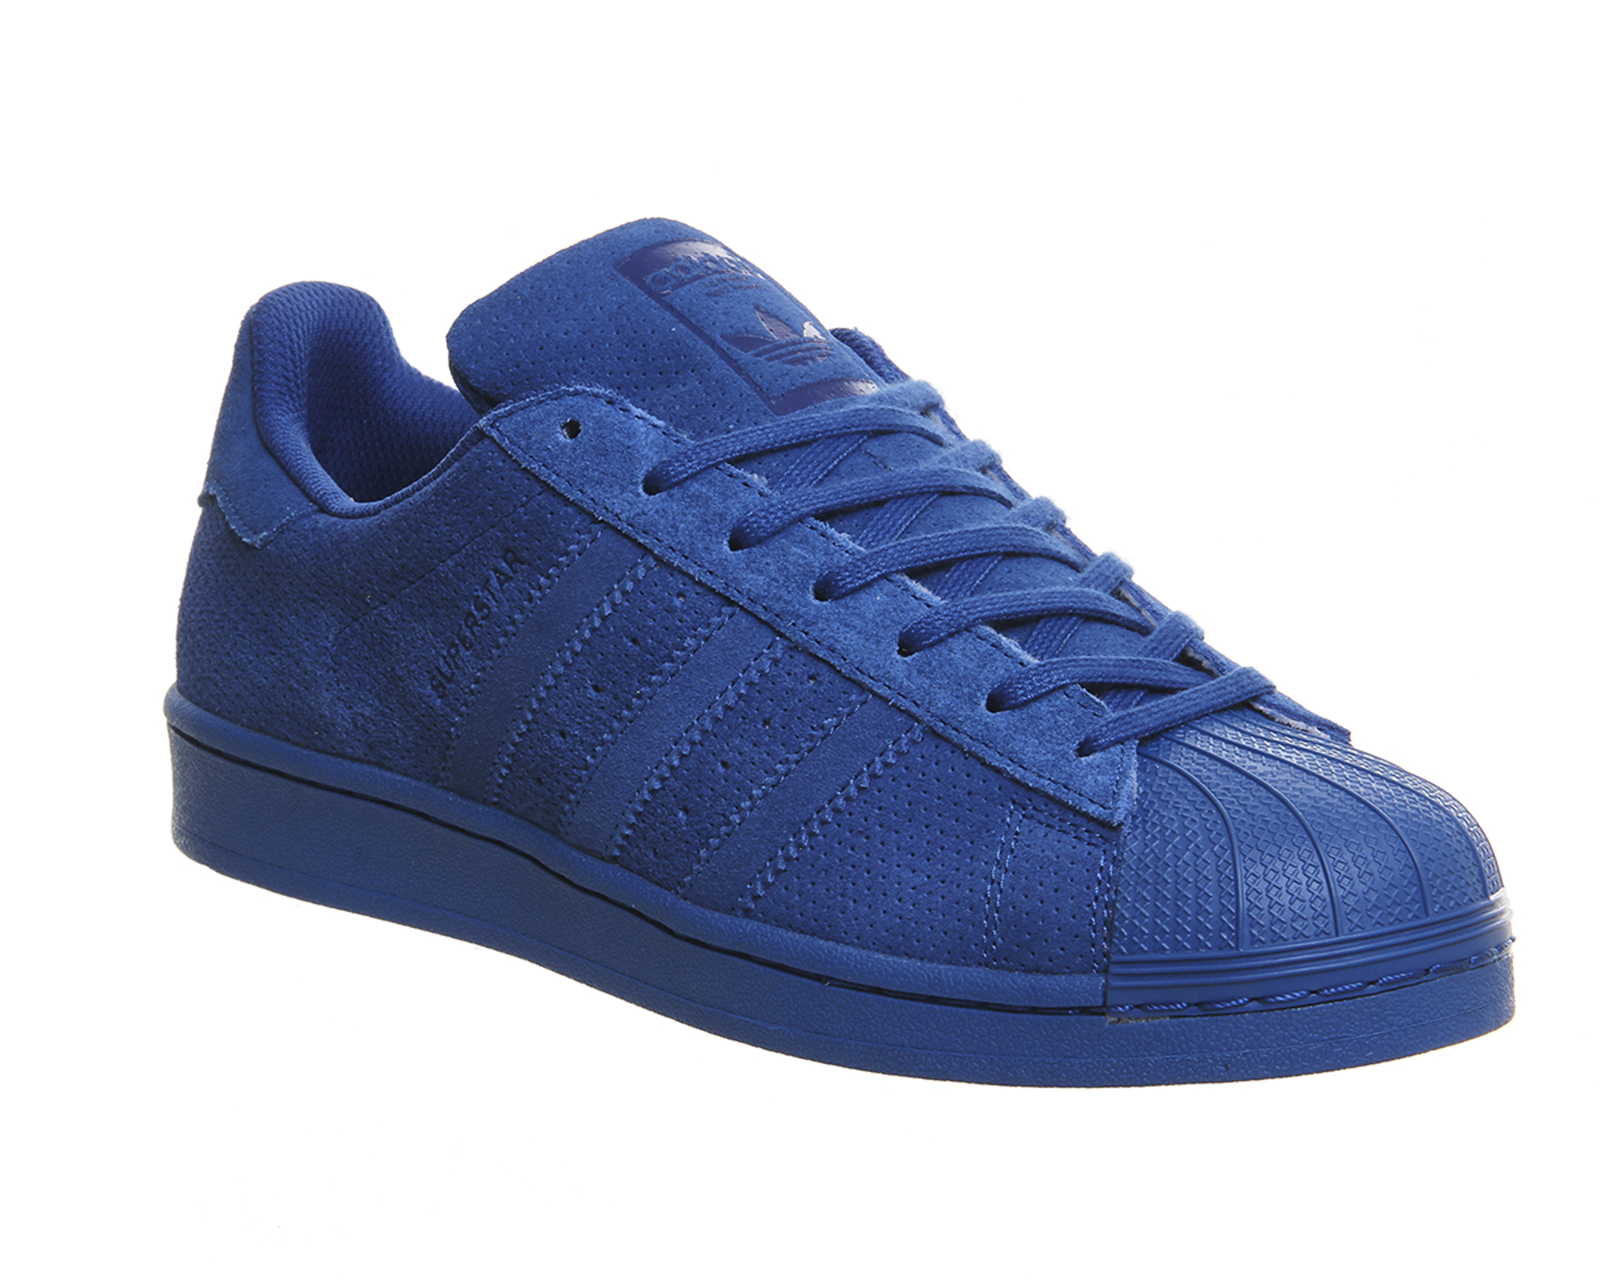 adidas superstar blu camoscio